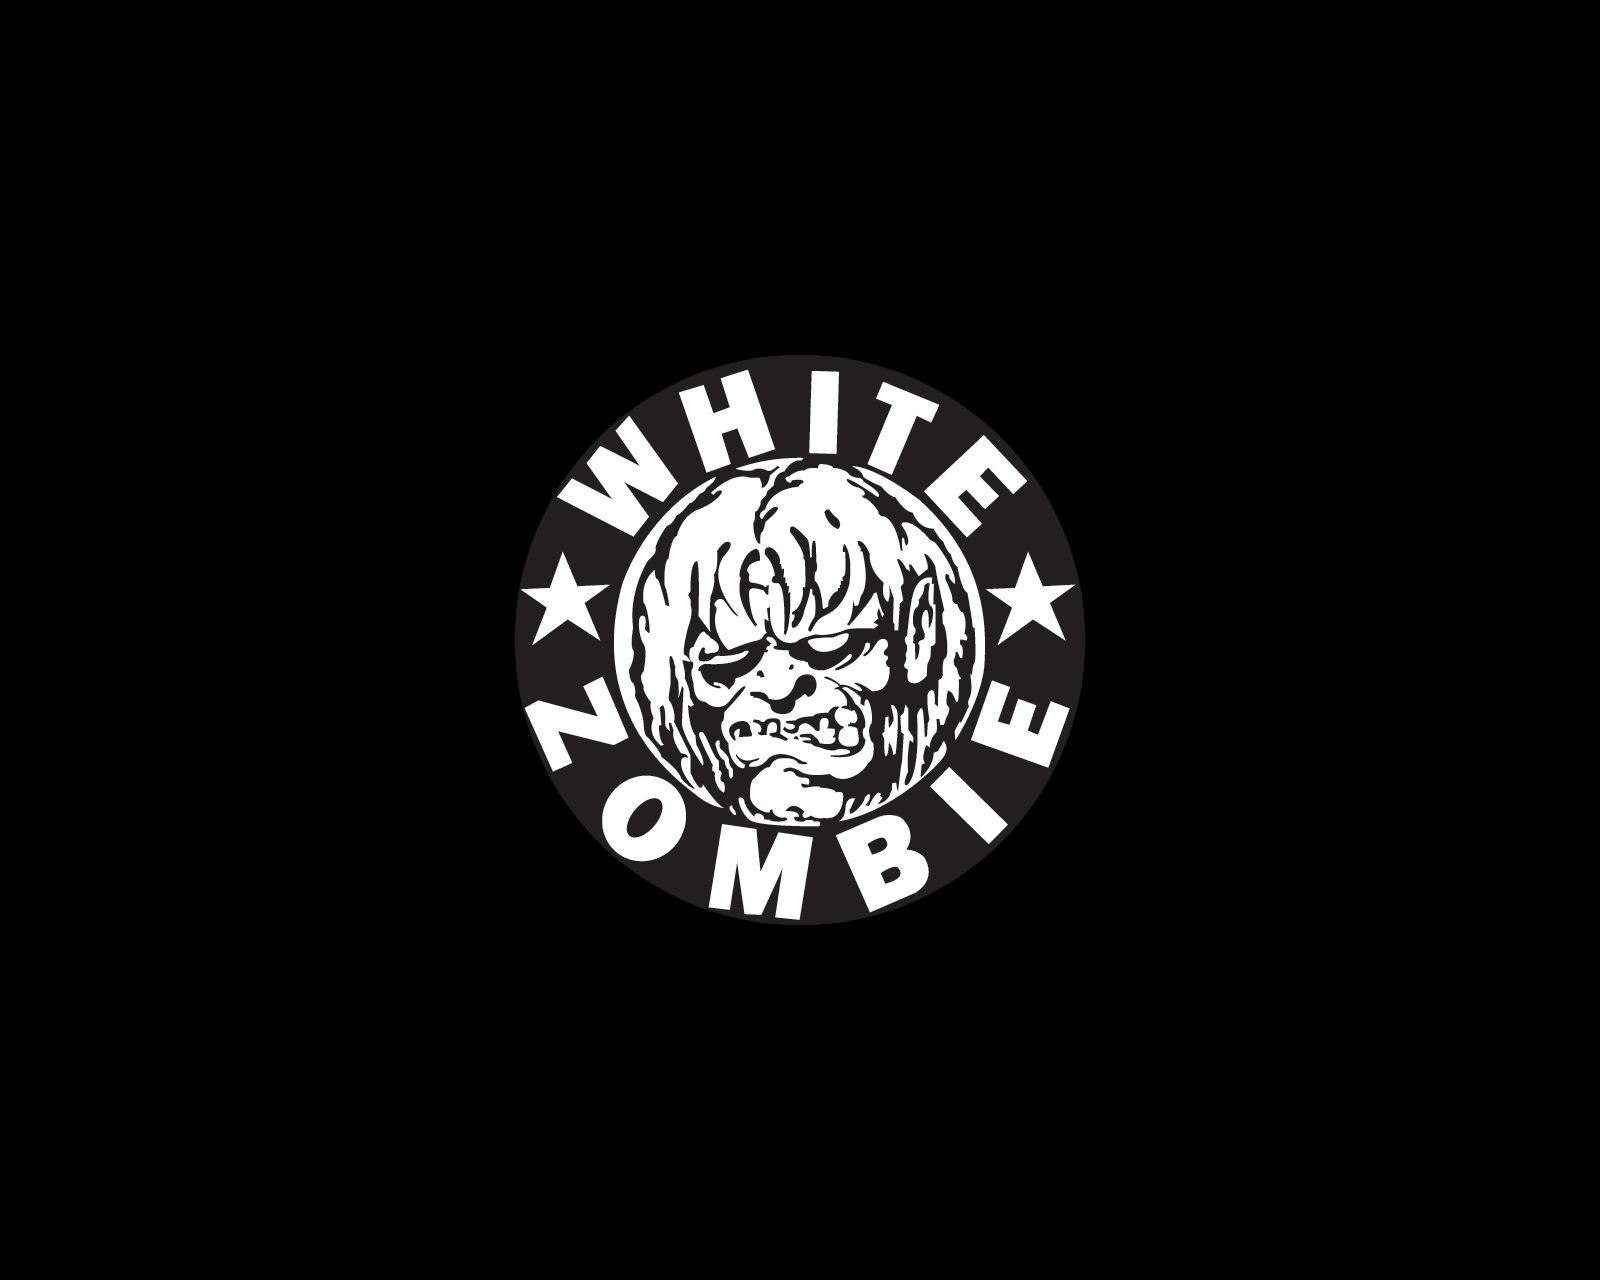 White Zombie White Zombie Zombie Wallpaper White Zombie Band